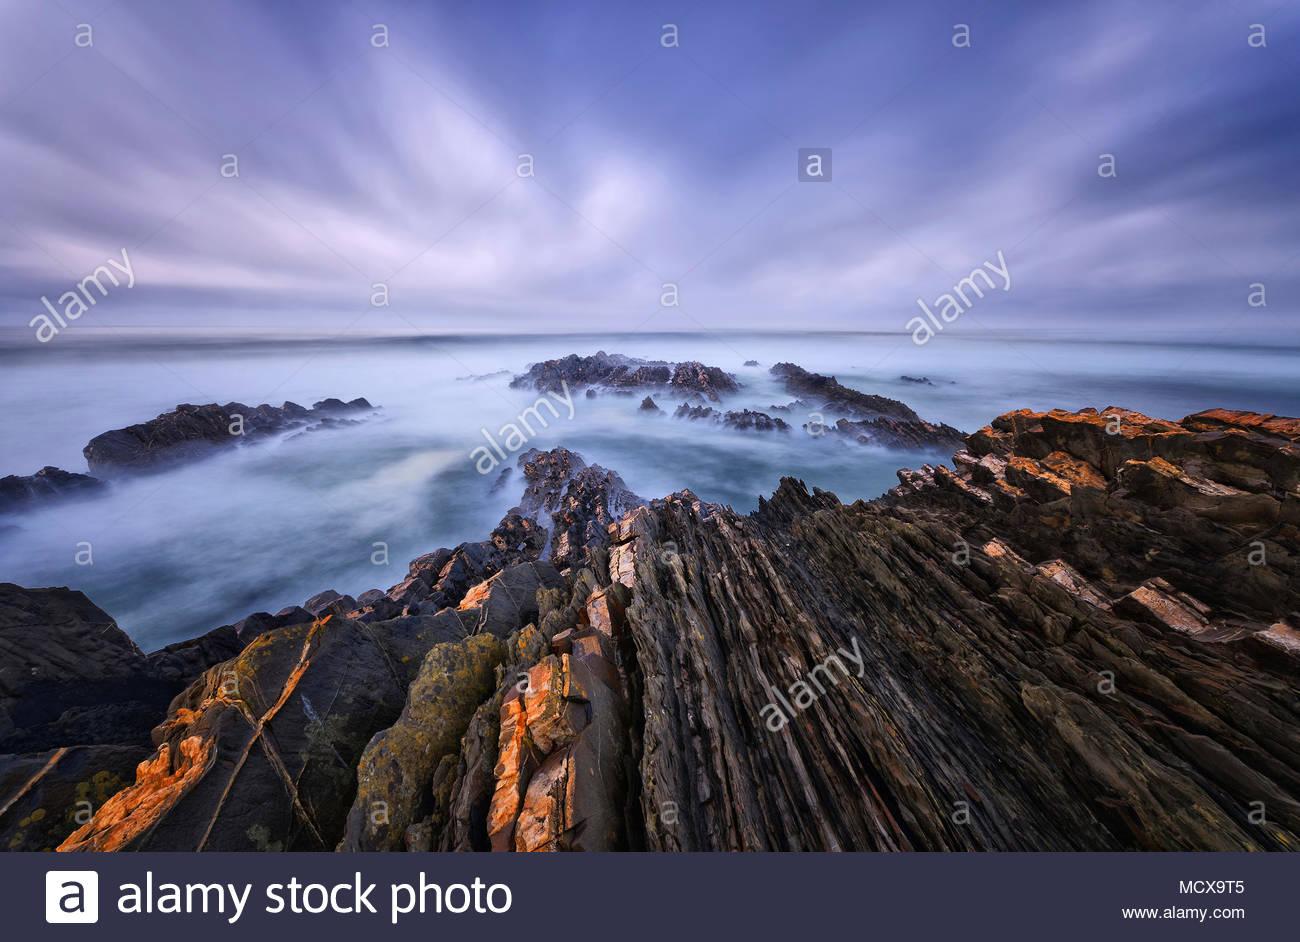 Küste in der blauen Stunde, Almograve, Algarve, Portugal   Küste in der Blauen Stunde, Almograve, Algarve, Portugal Stockbild